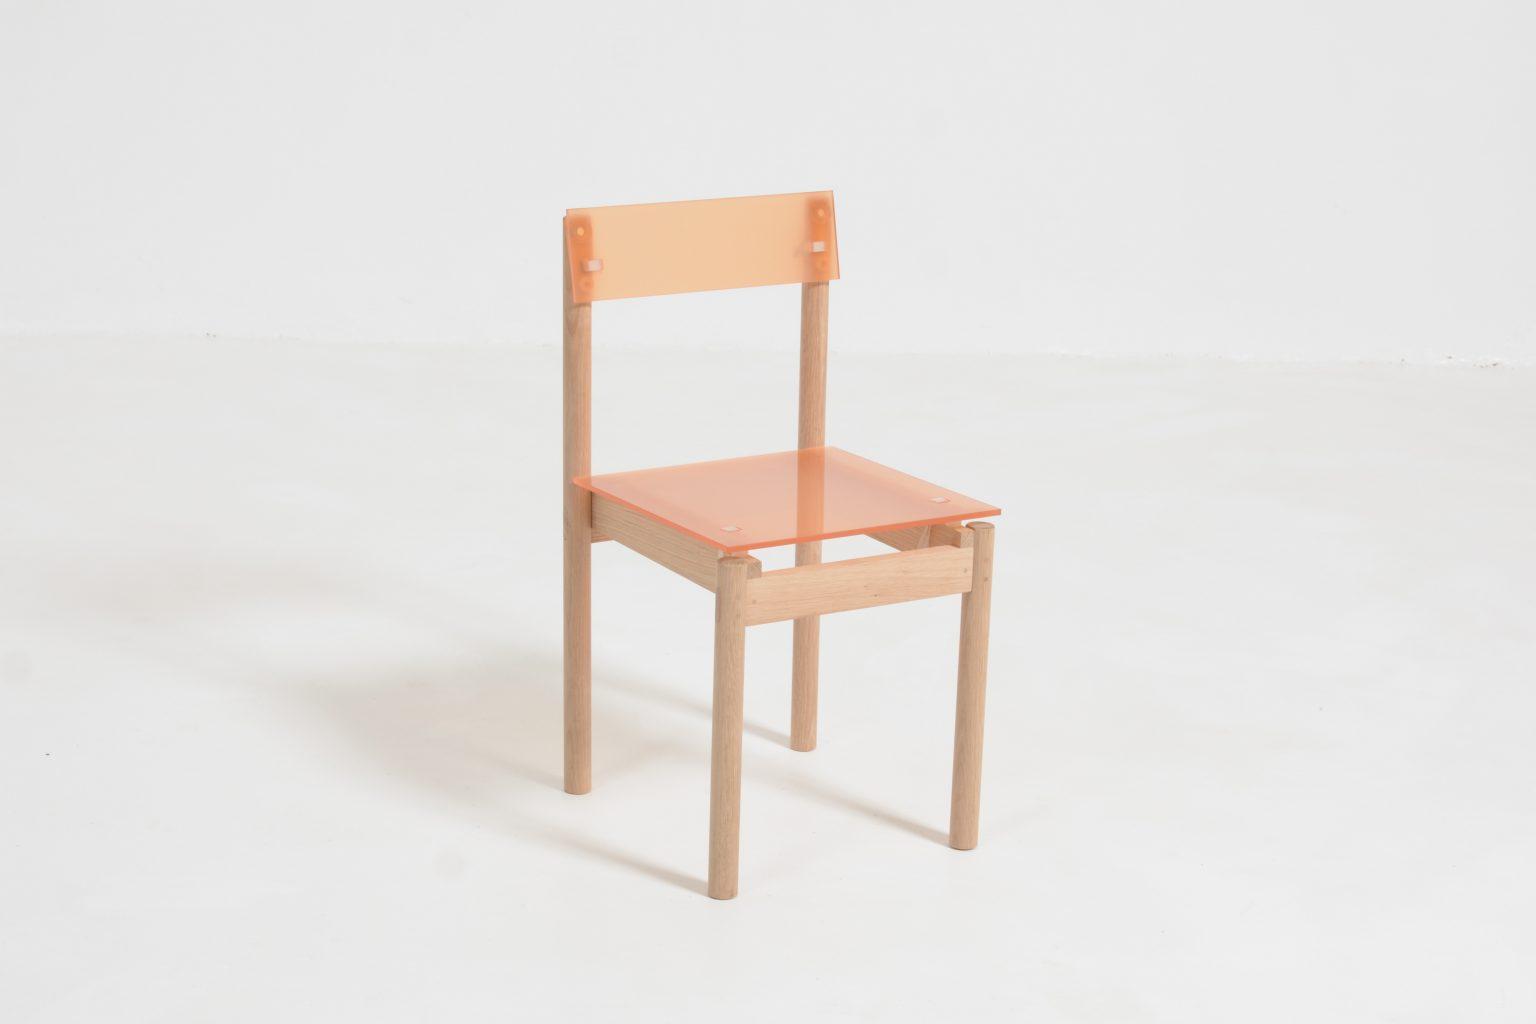 Biennale Interieur - Belgium's leading design and interior event - Final-chair-1.jpg